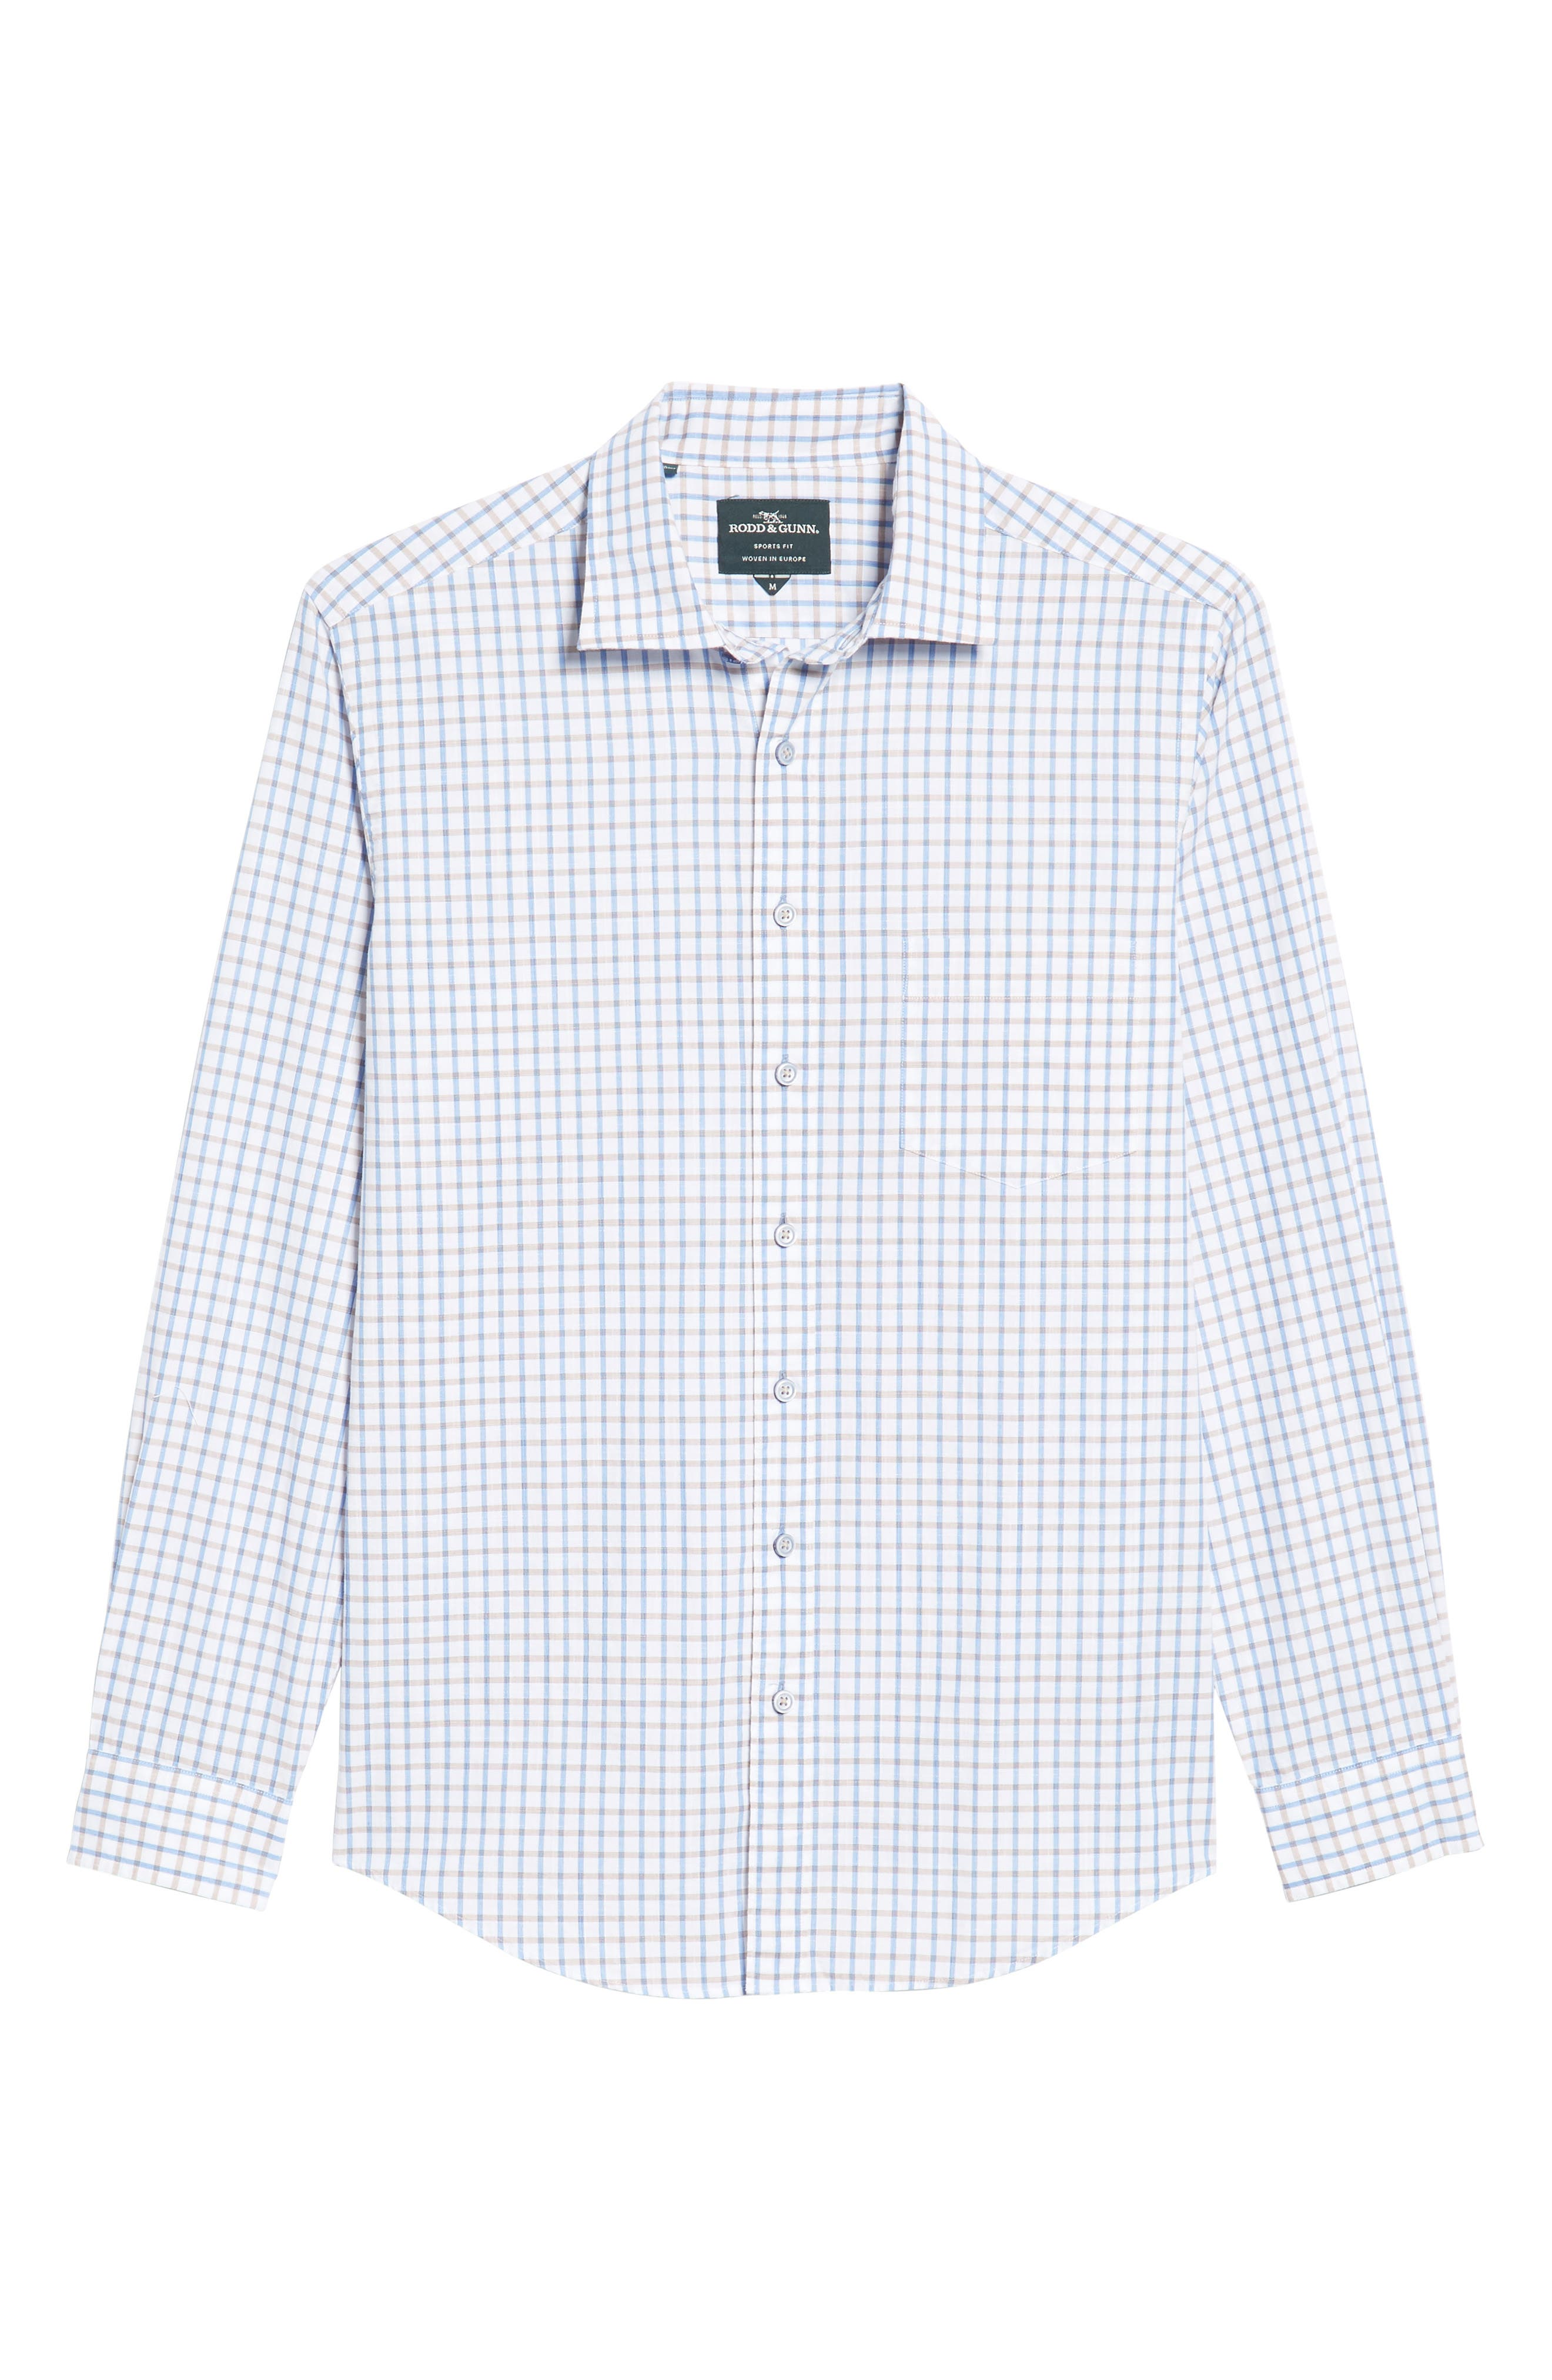 Mount Edward Check Sport Shirt,                             Alternate thumbnail 6, color,                             111